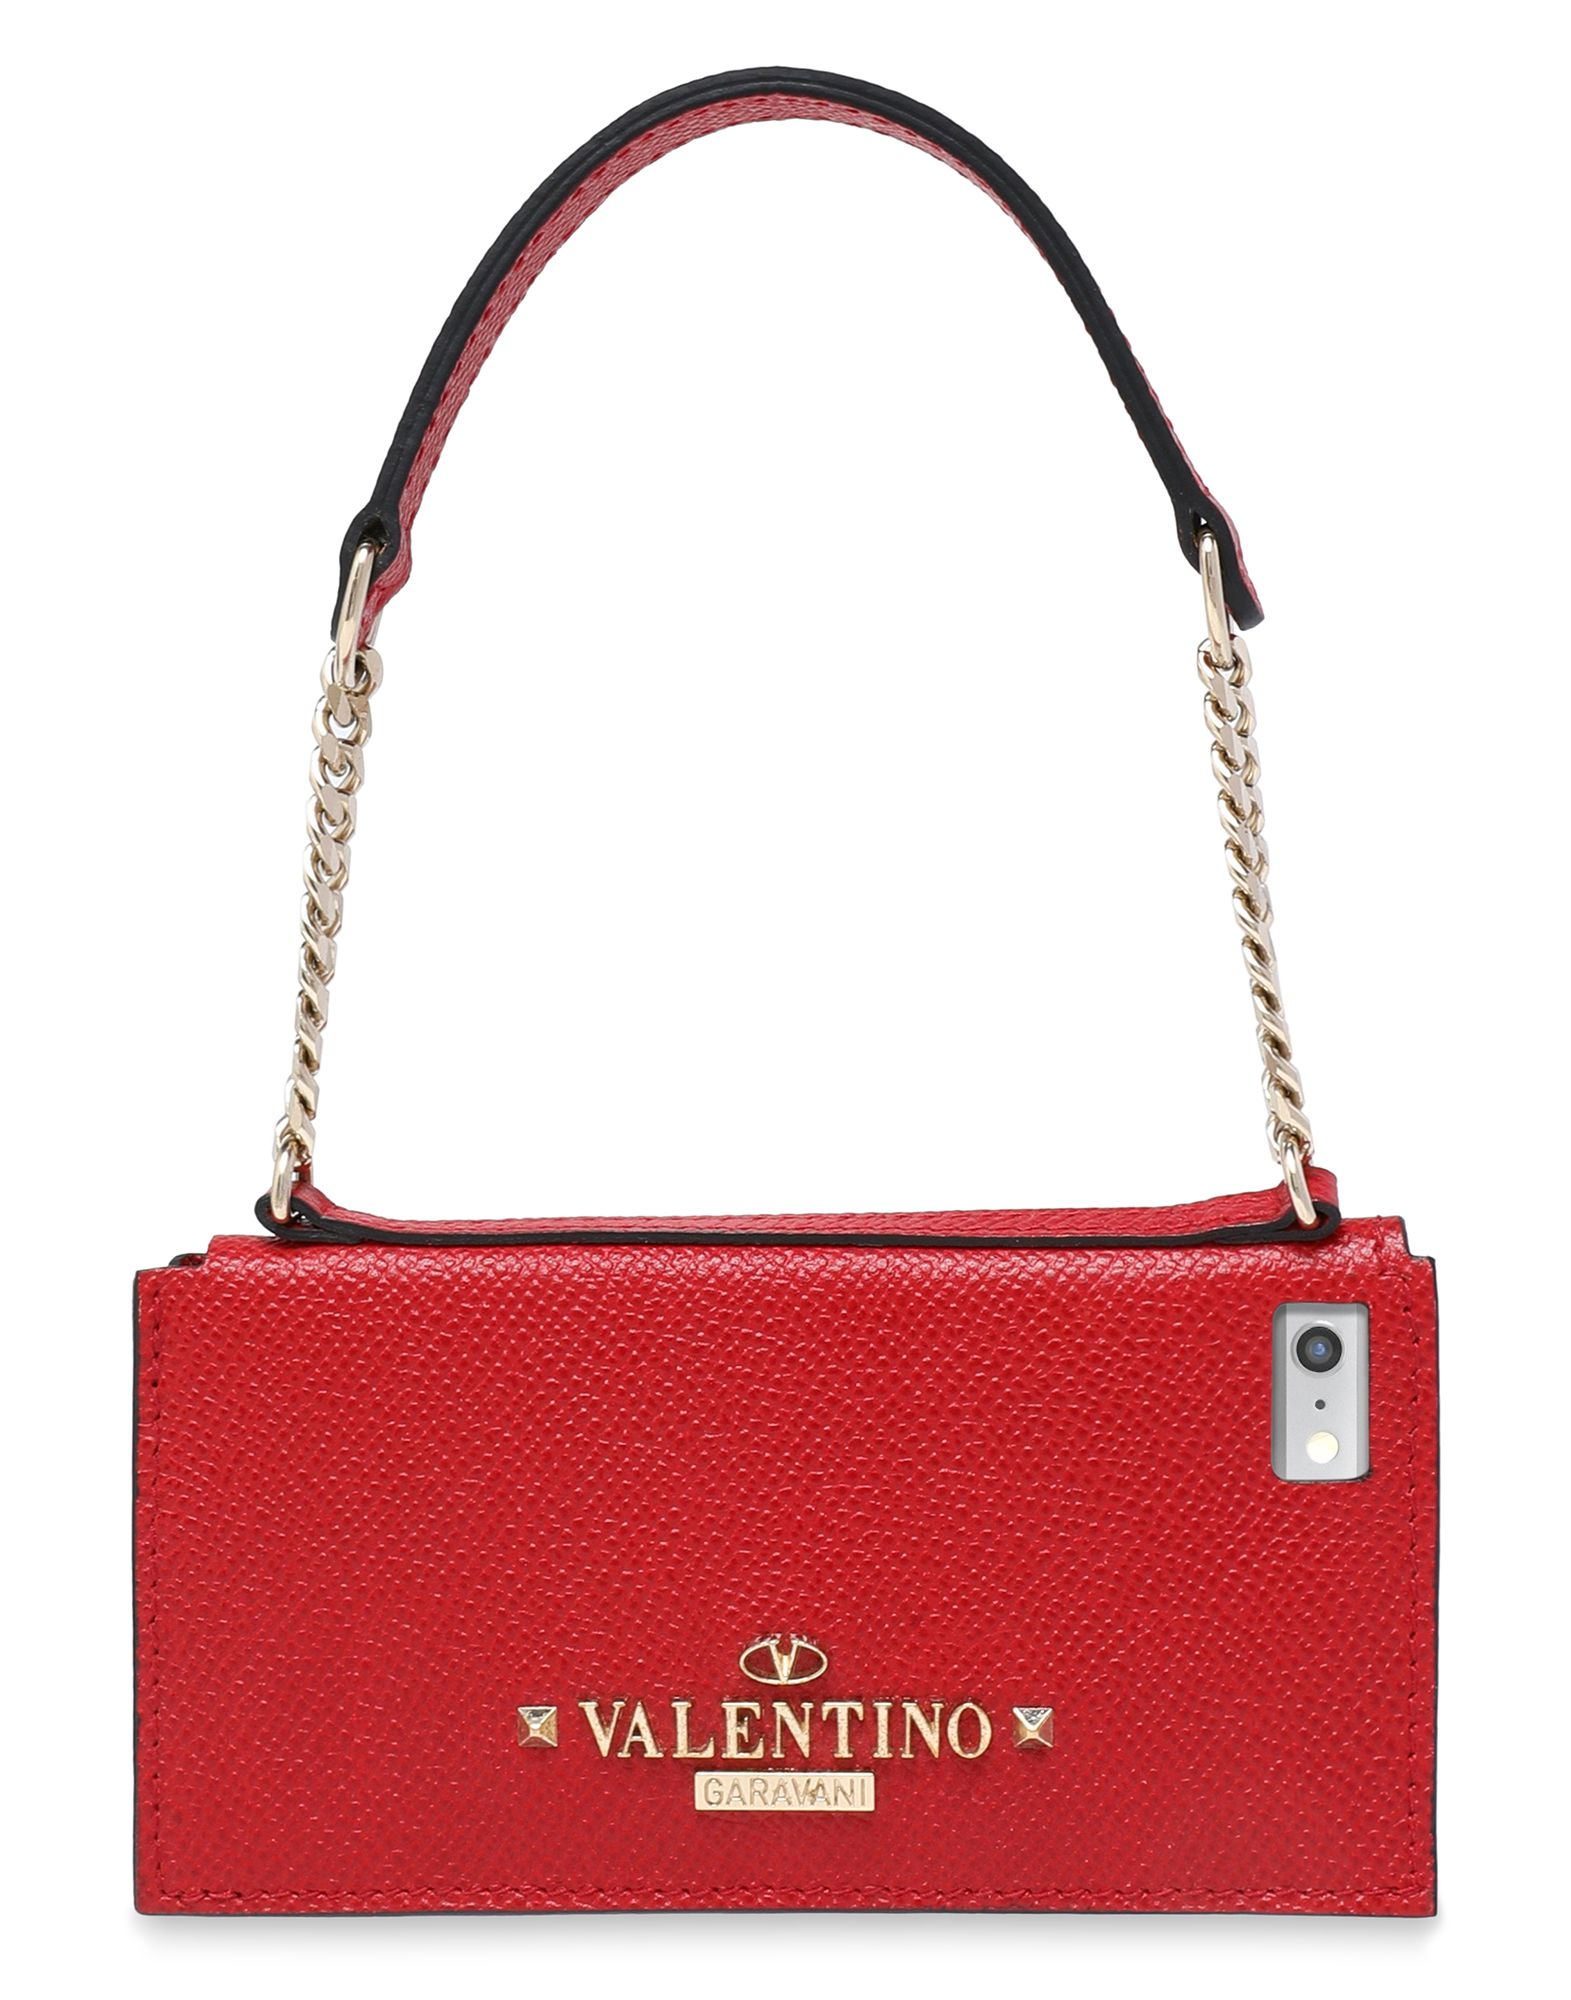 Фото - VALENTINO GARAVANI Чехол red valentino черный джемпер в полоску